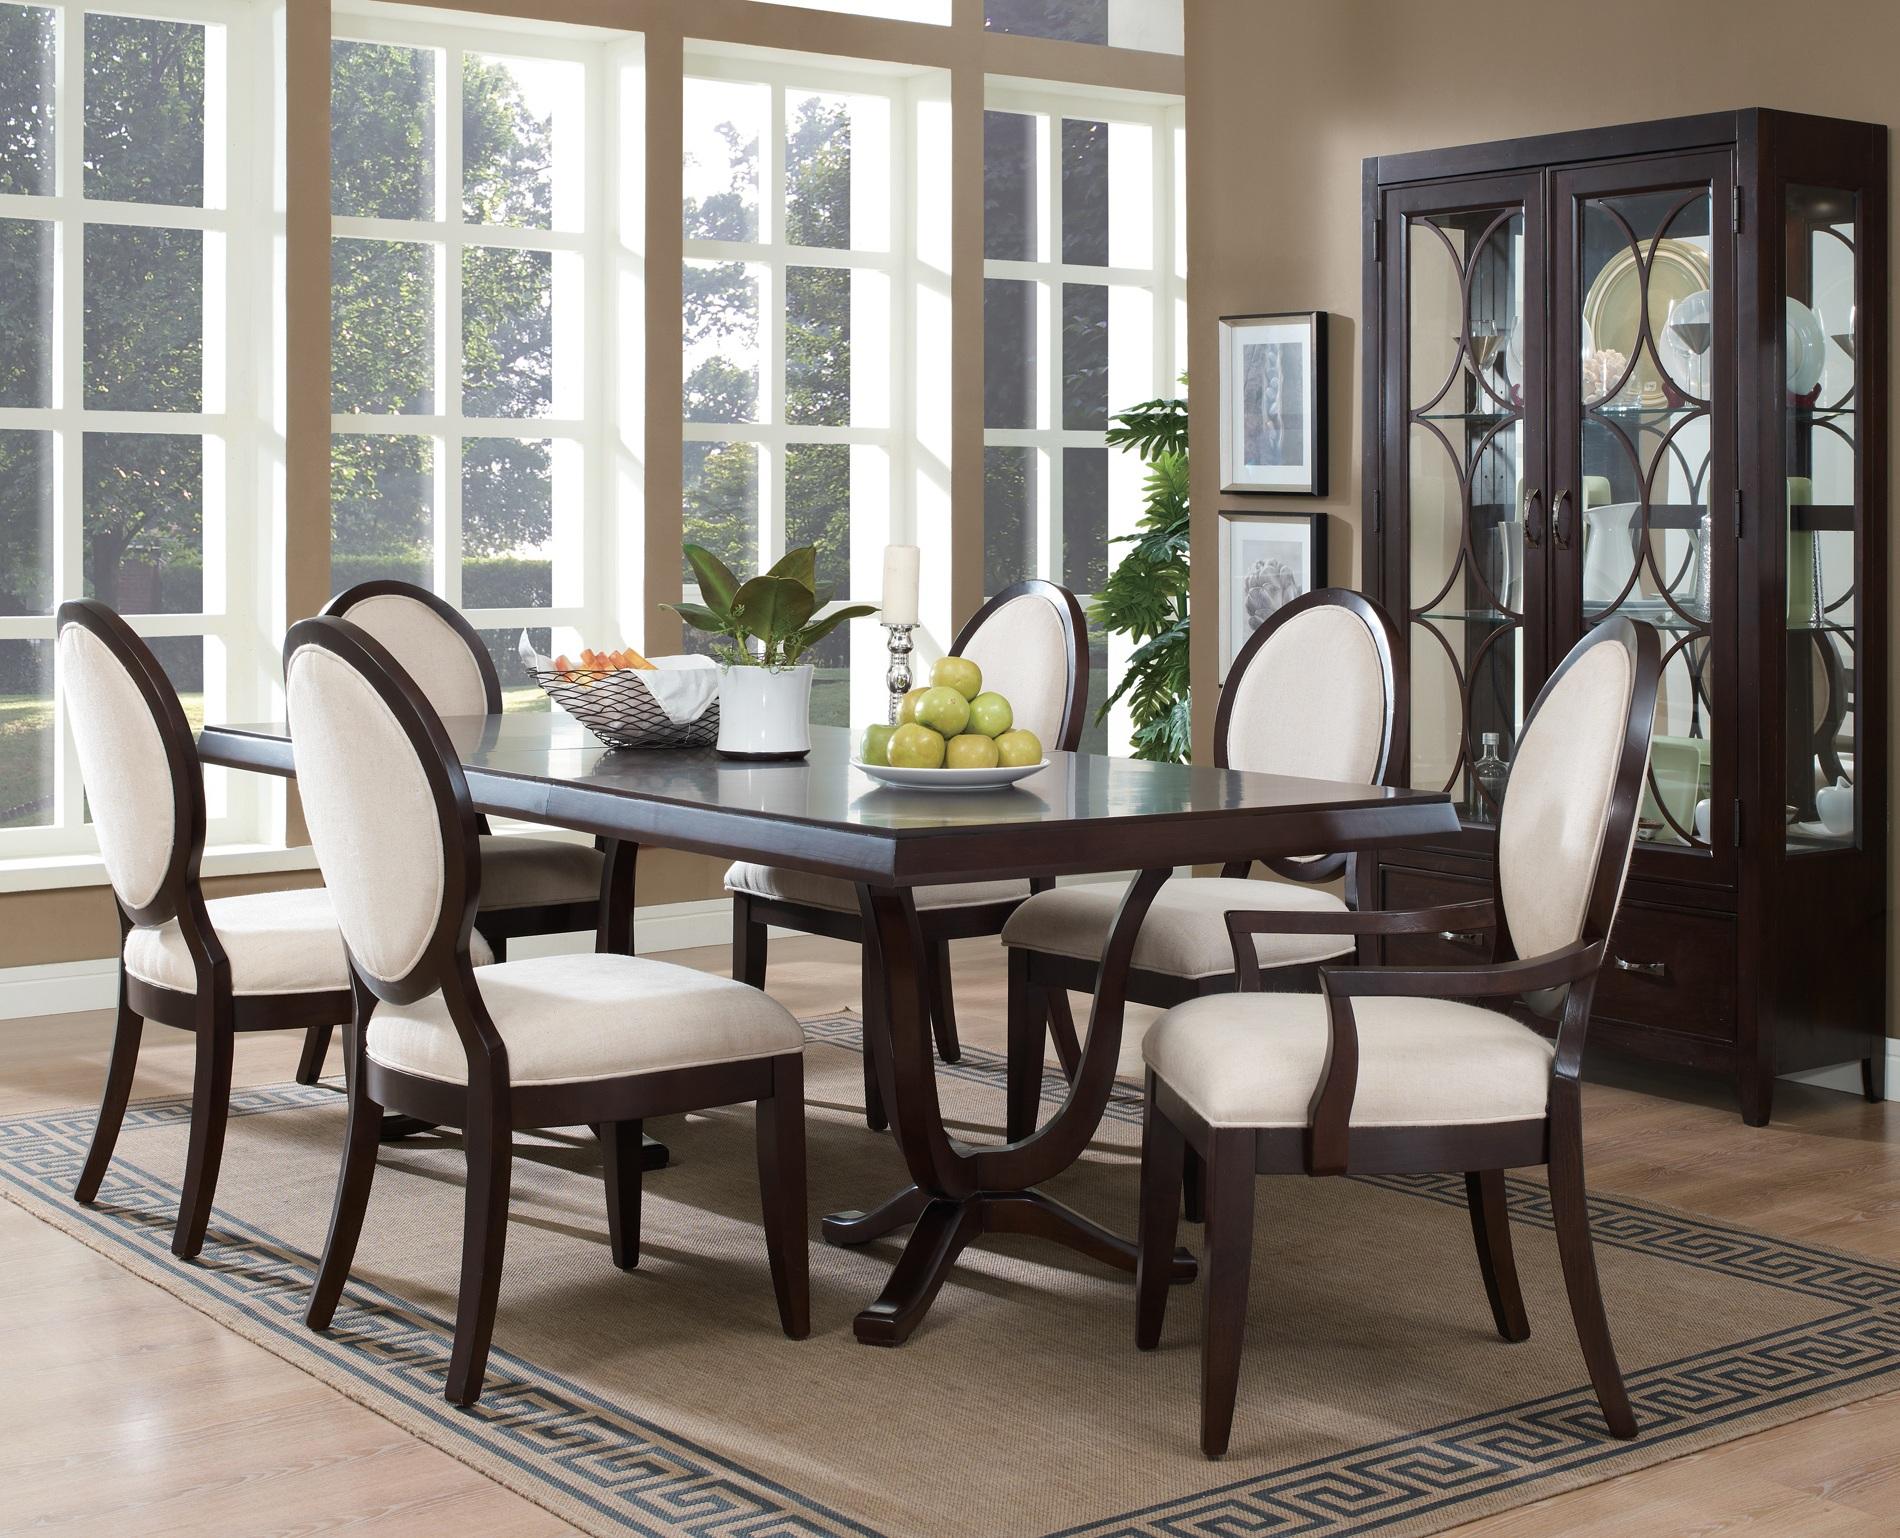 cara membuat kursi makan bergaya modern klasik